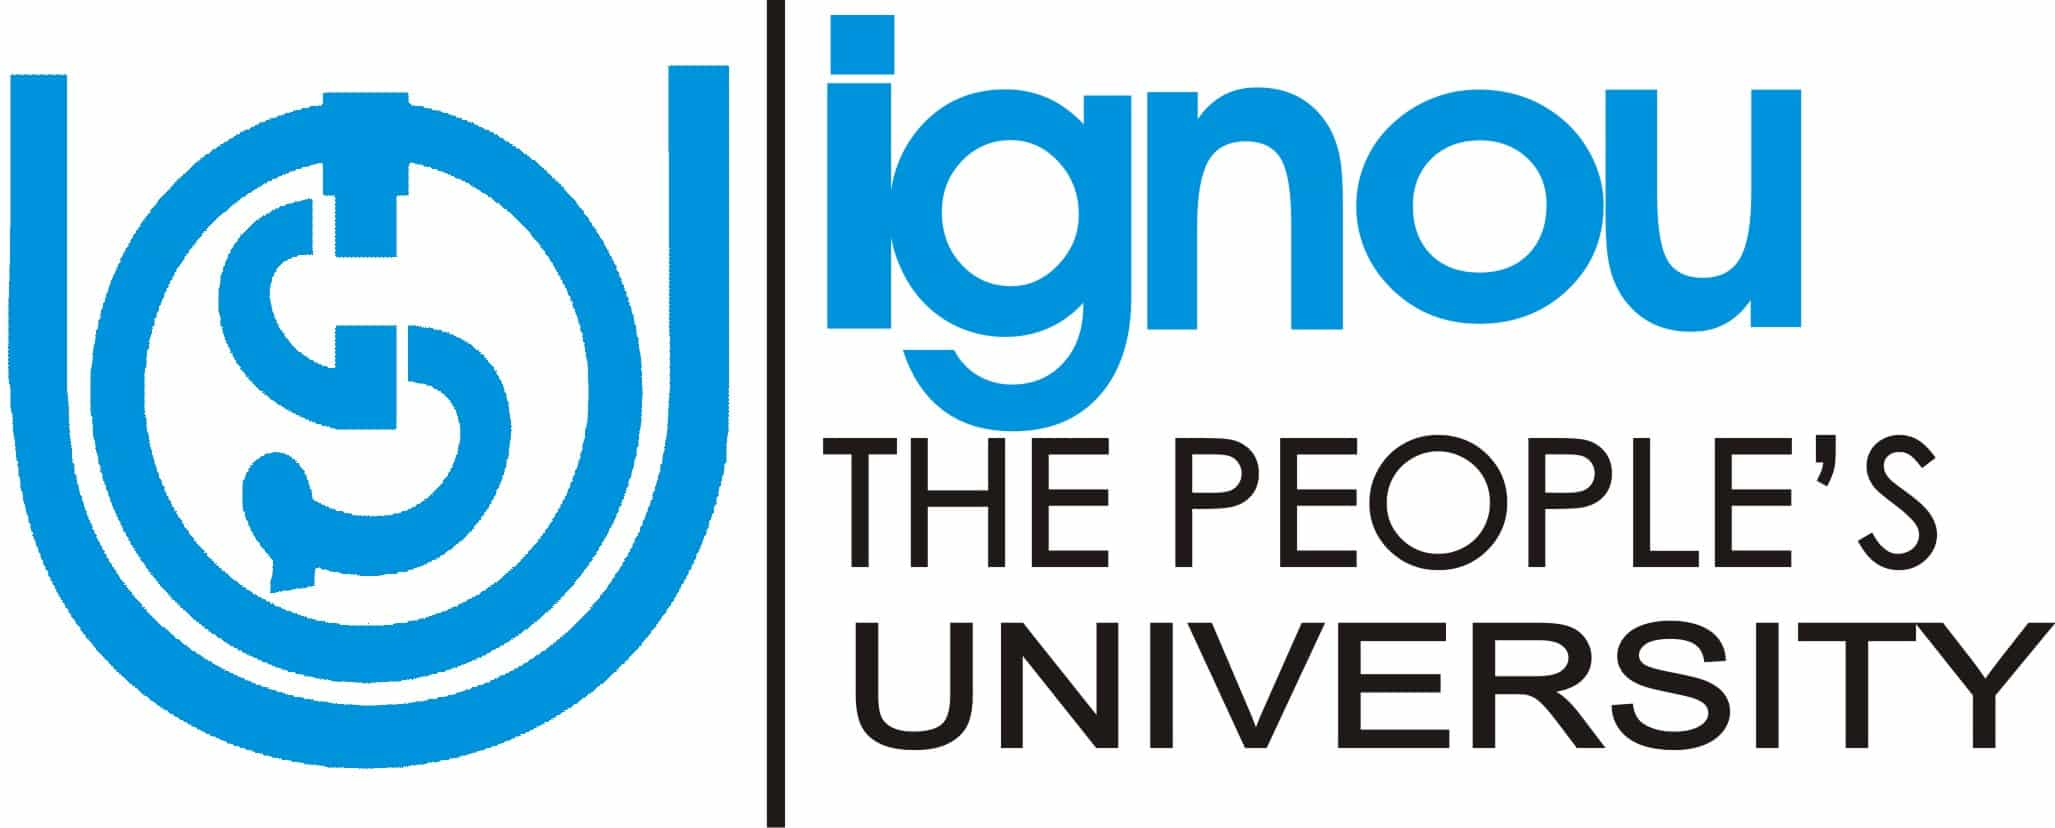 My Story Of Graduation from World's Largest Open University - IGNOU